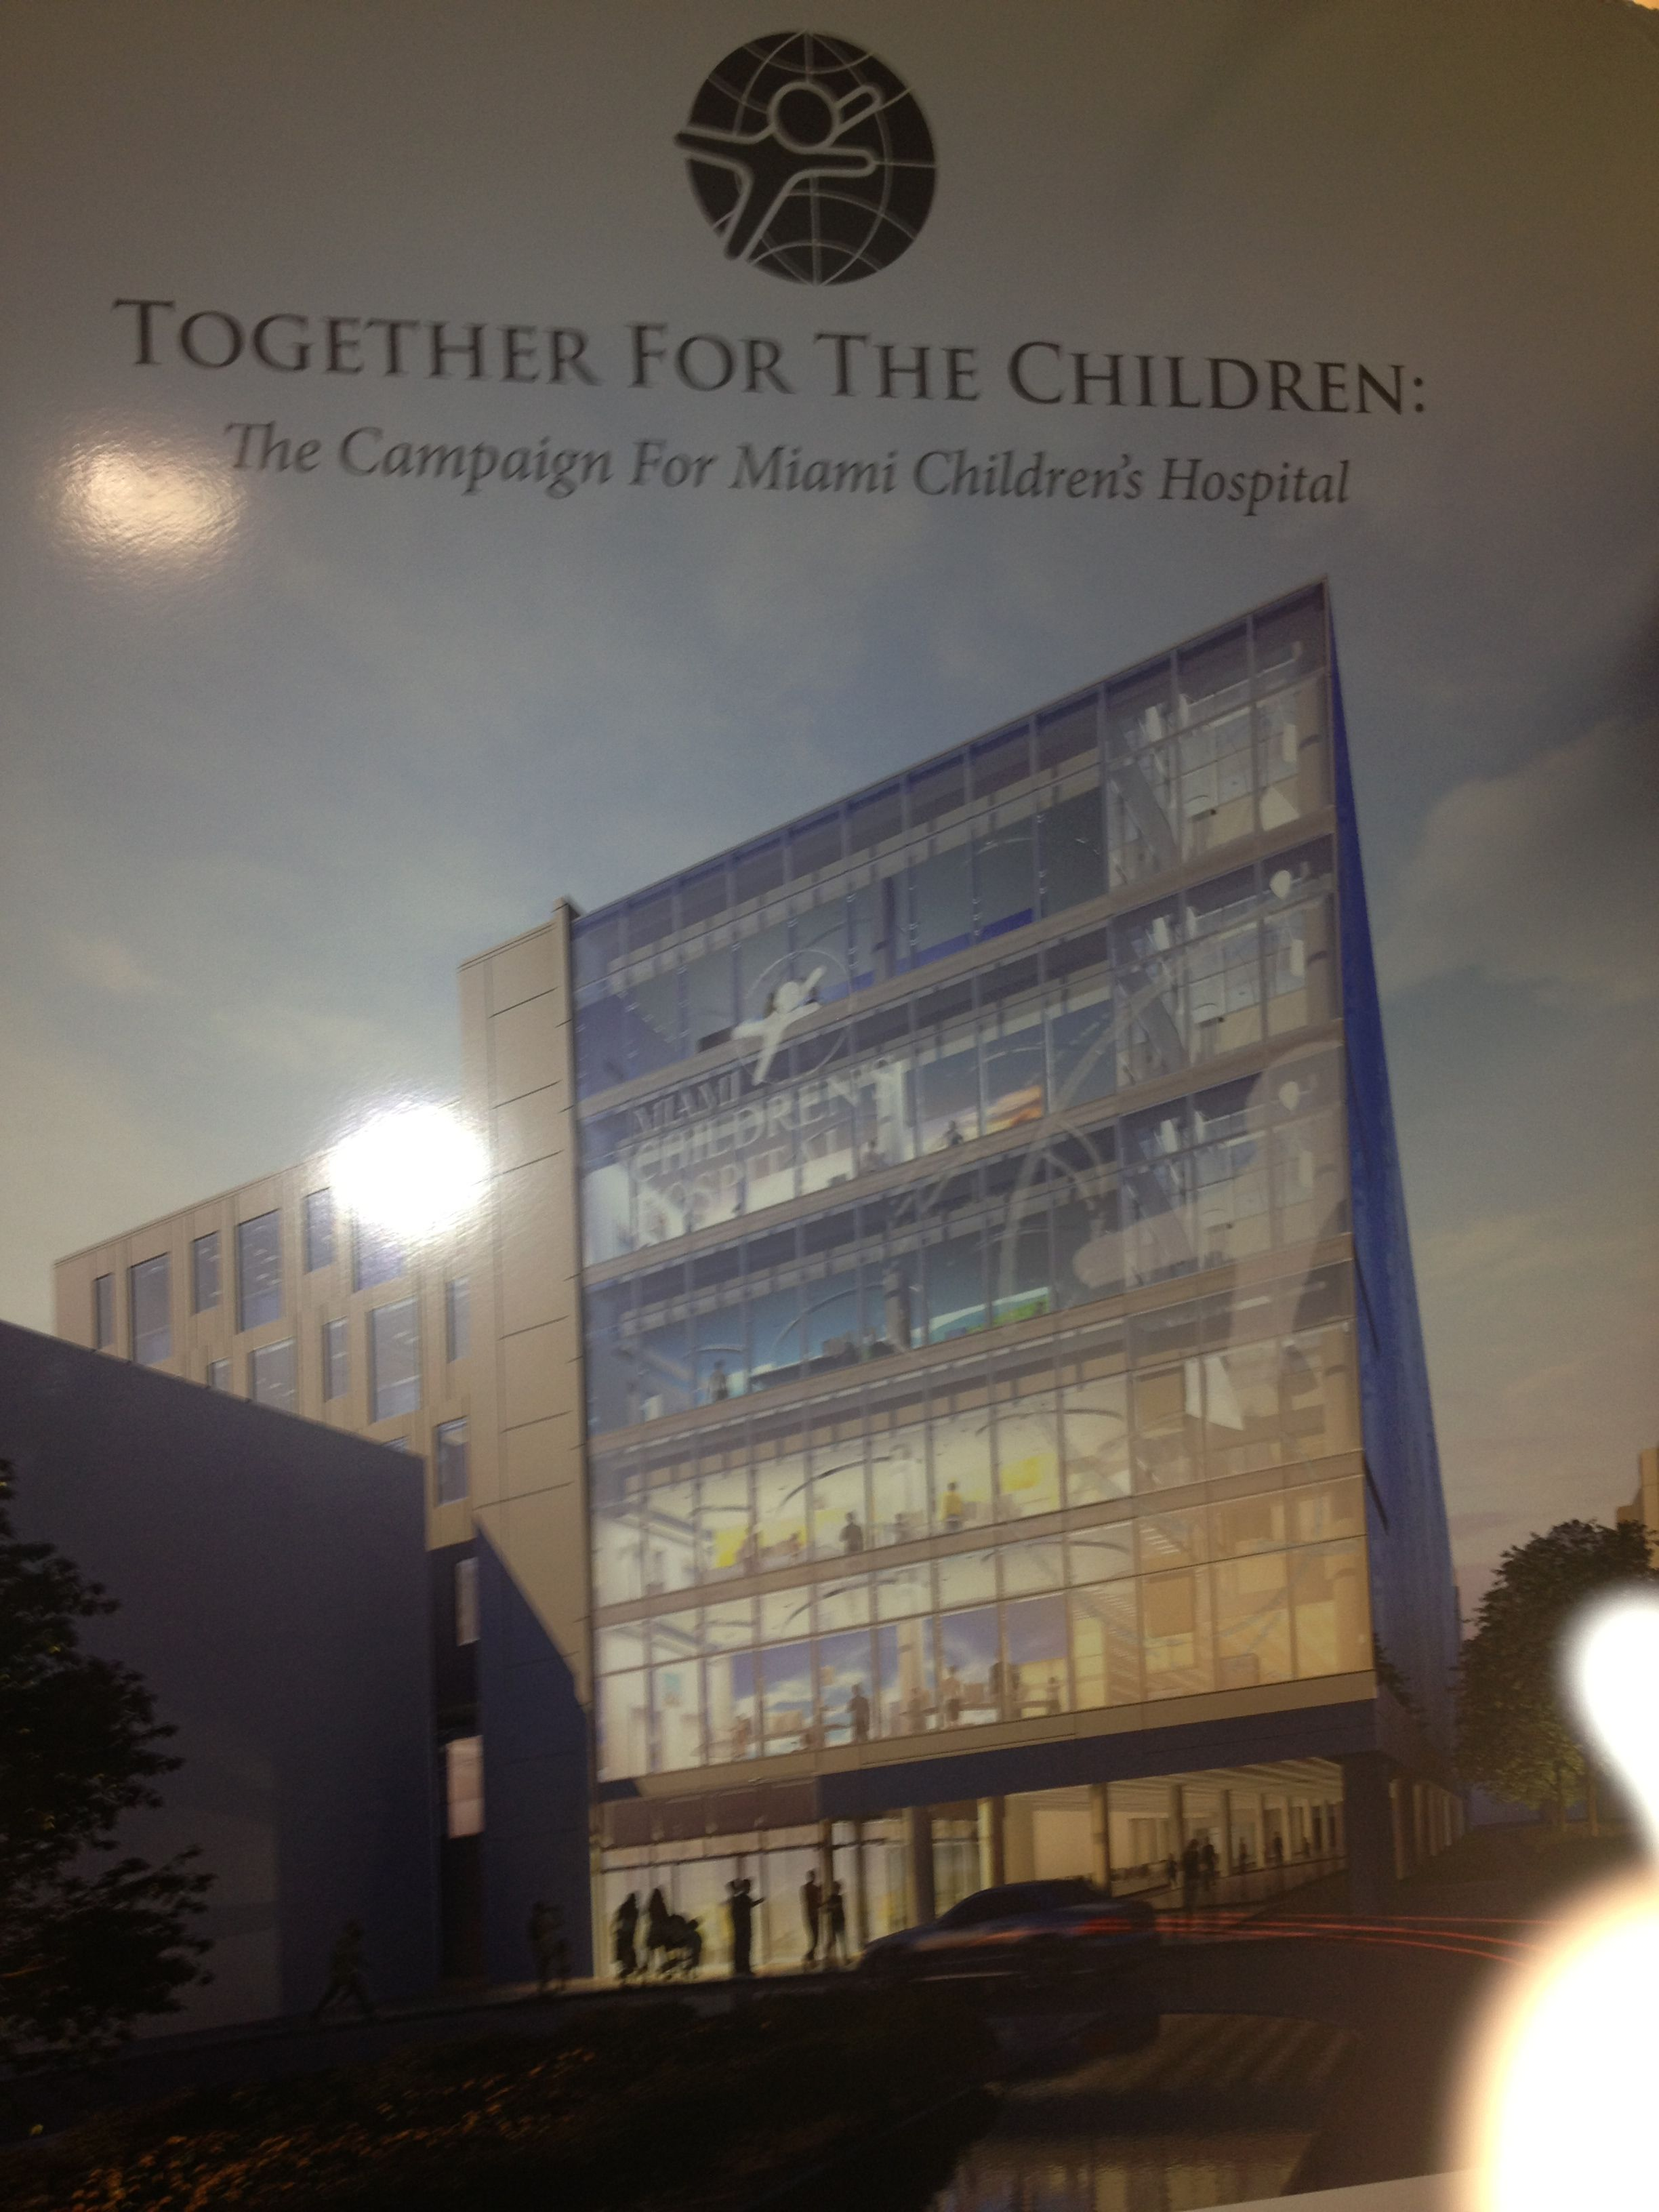 Miami children's hospital fundraiser Hot air balloon